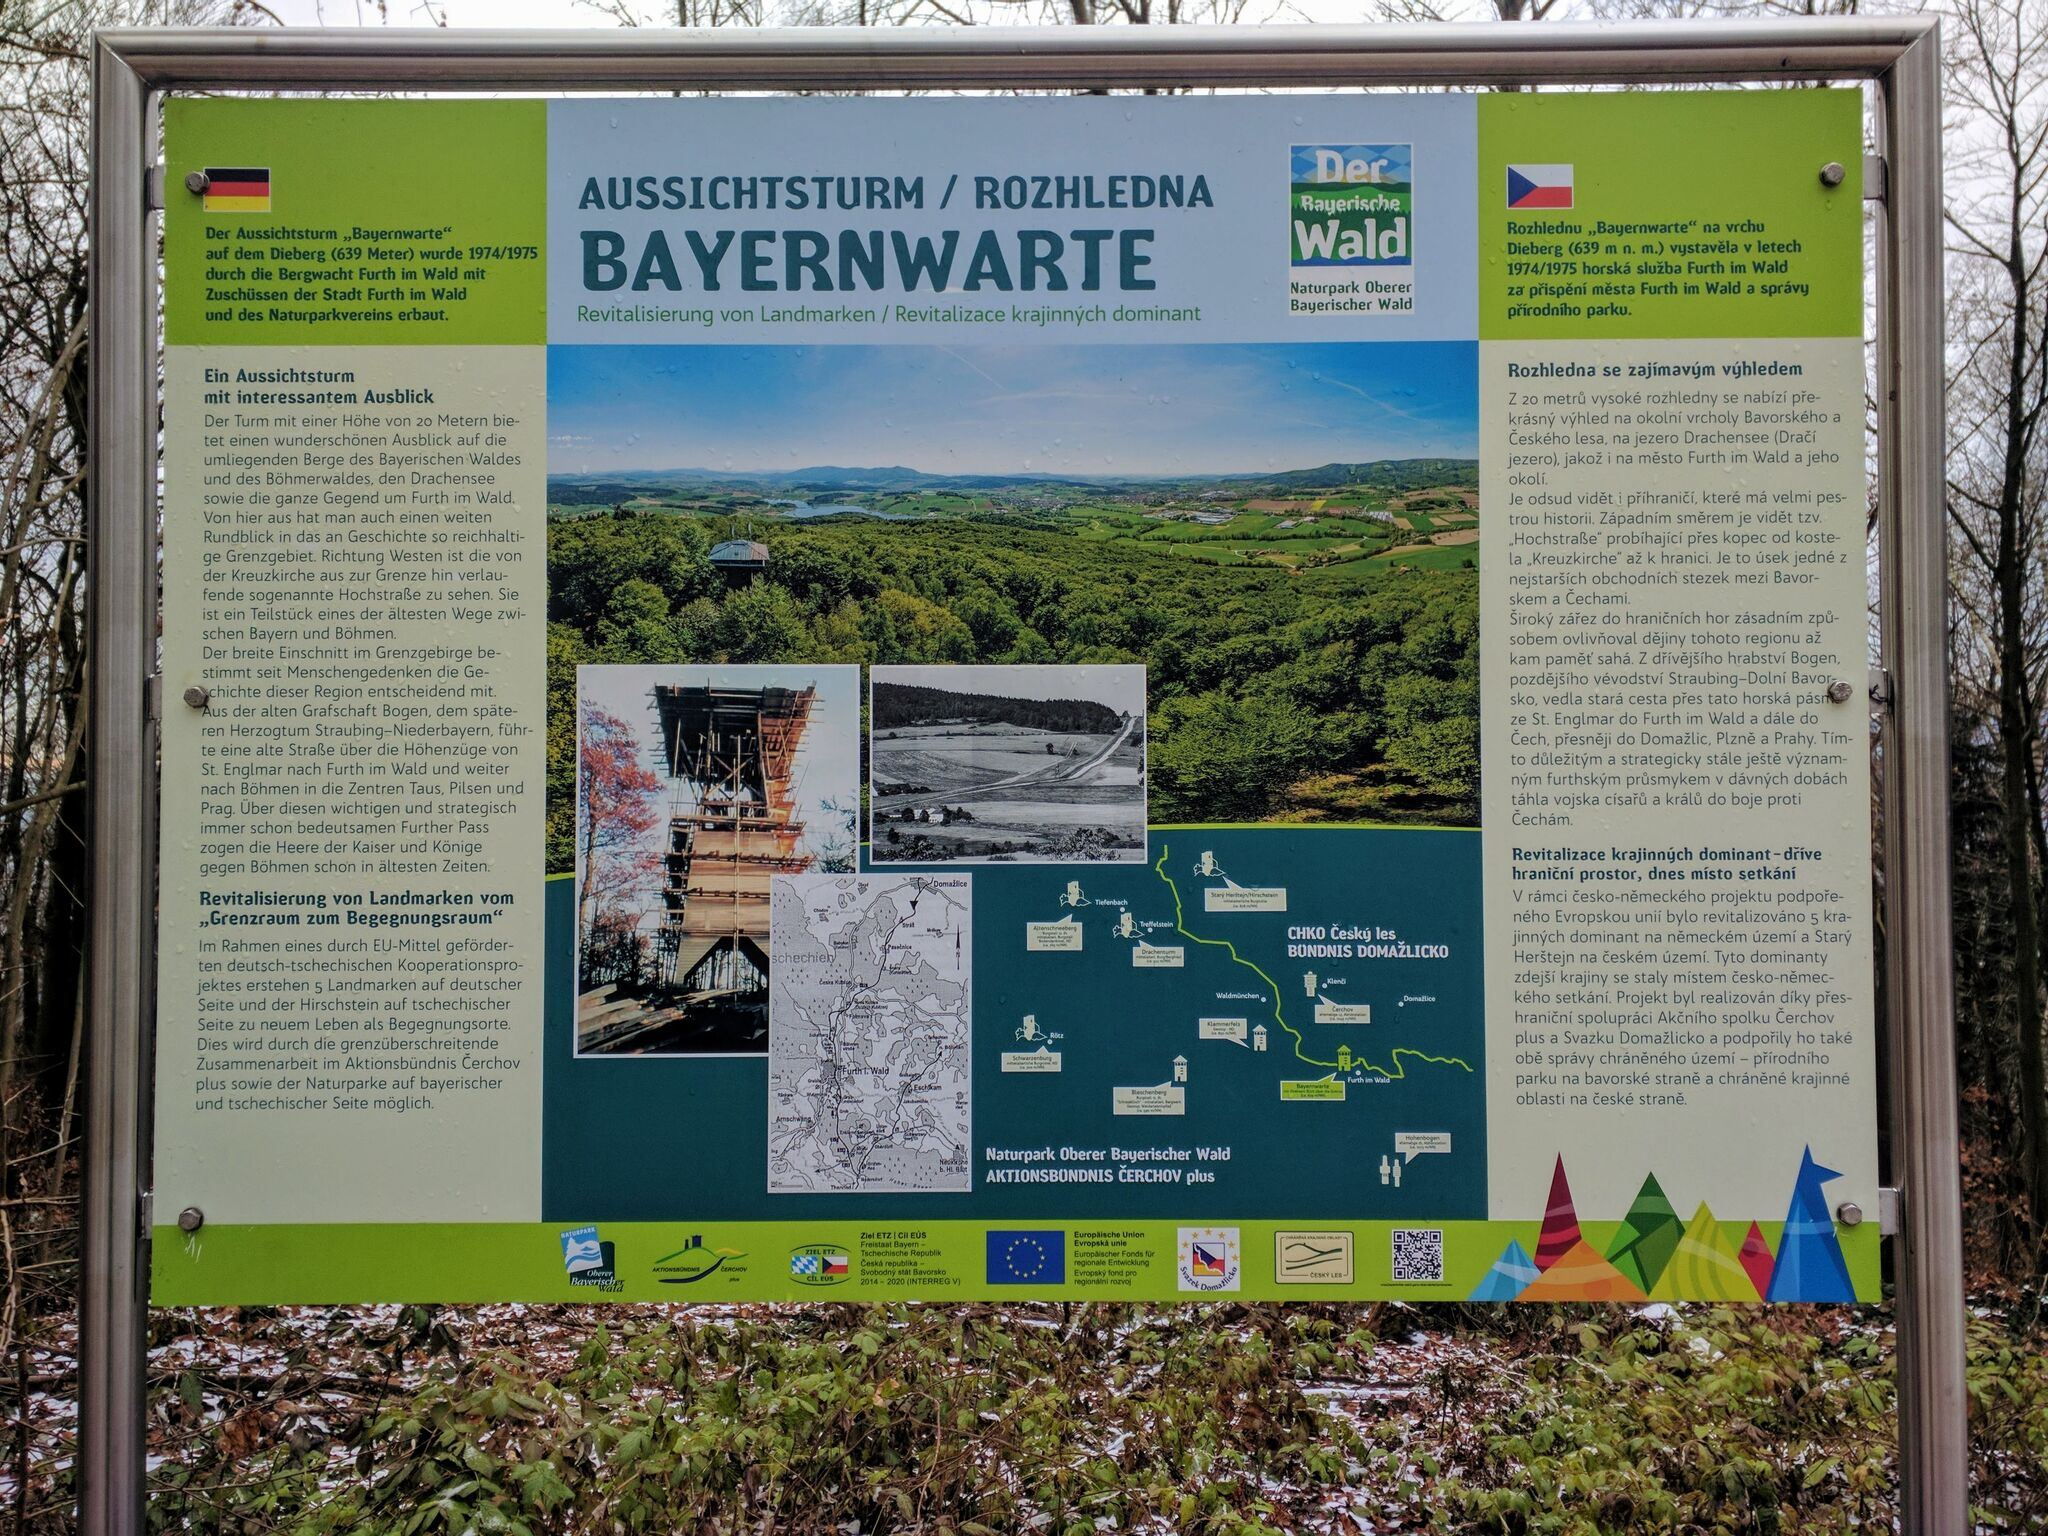 Bayernwarte